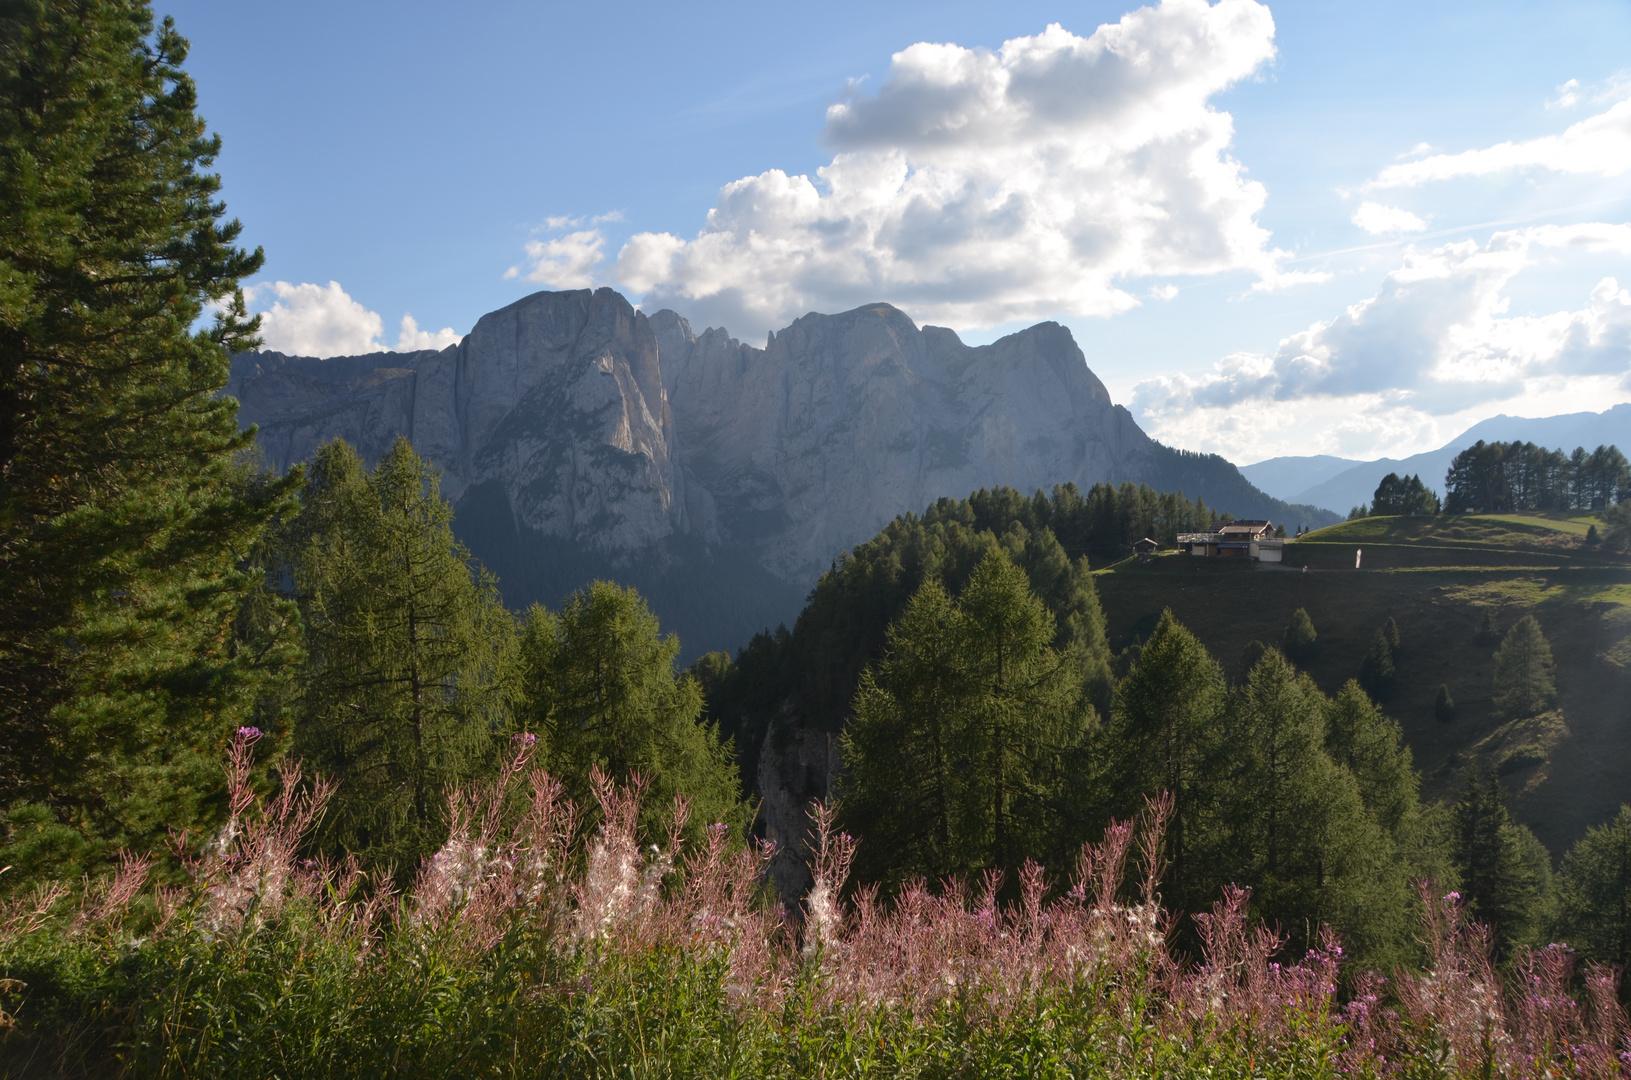 Blick zum Rifugio Alpino Buffaure